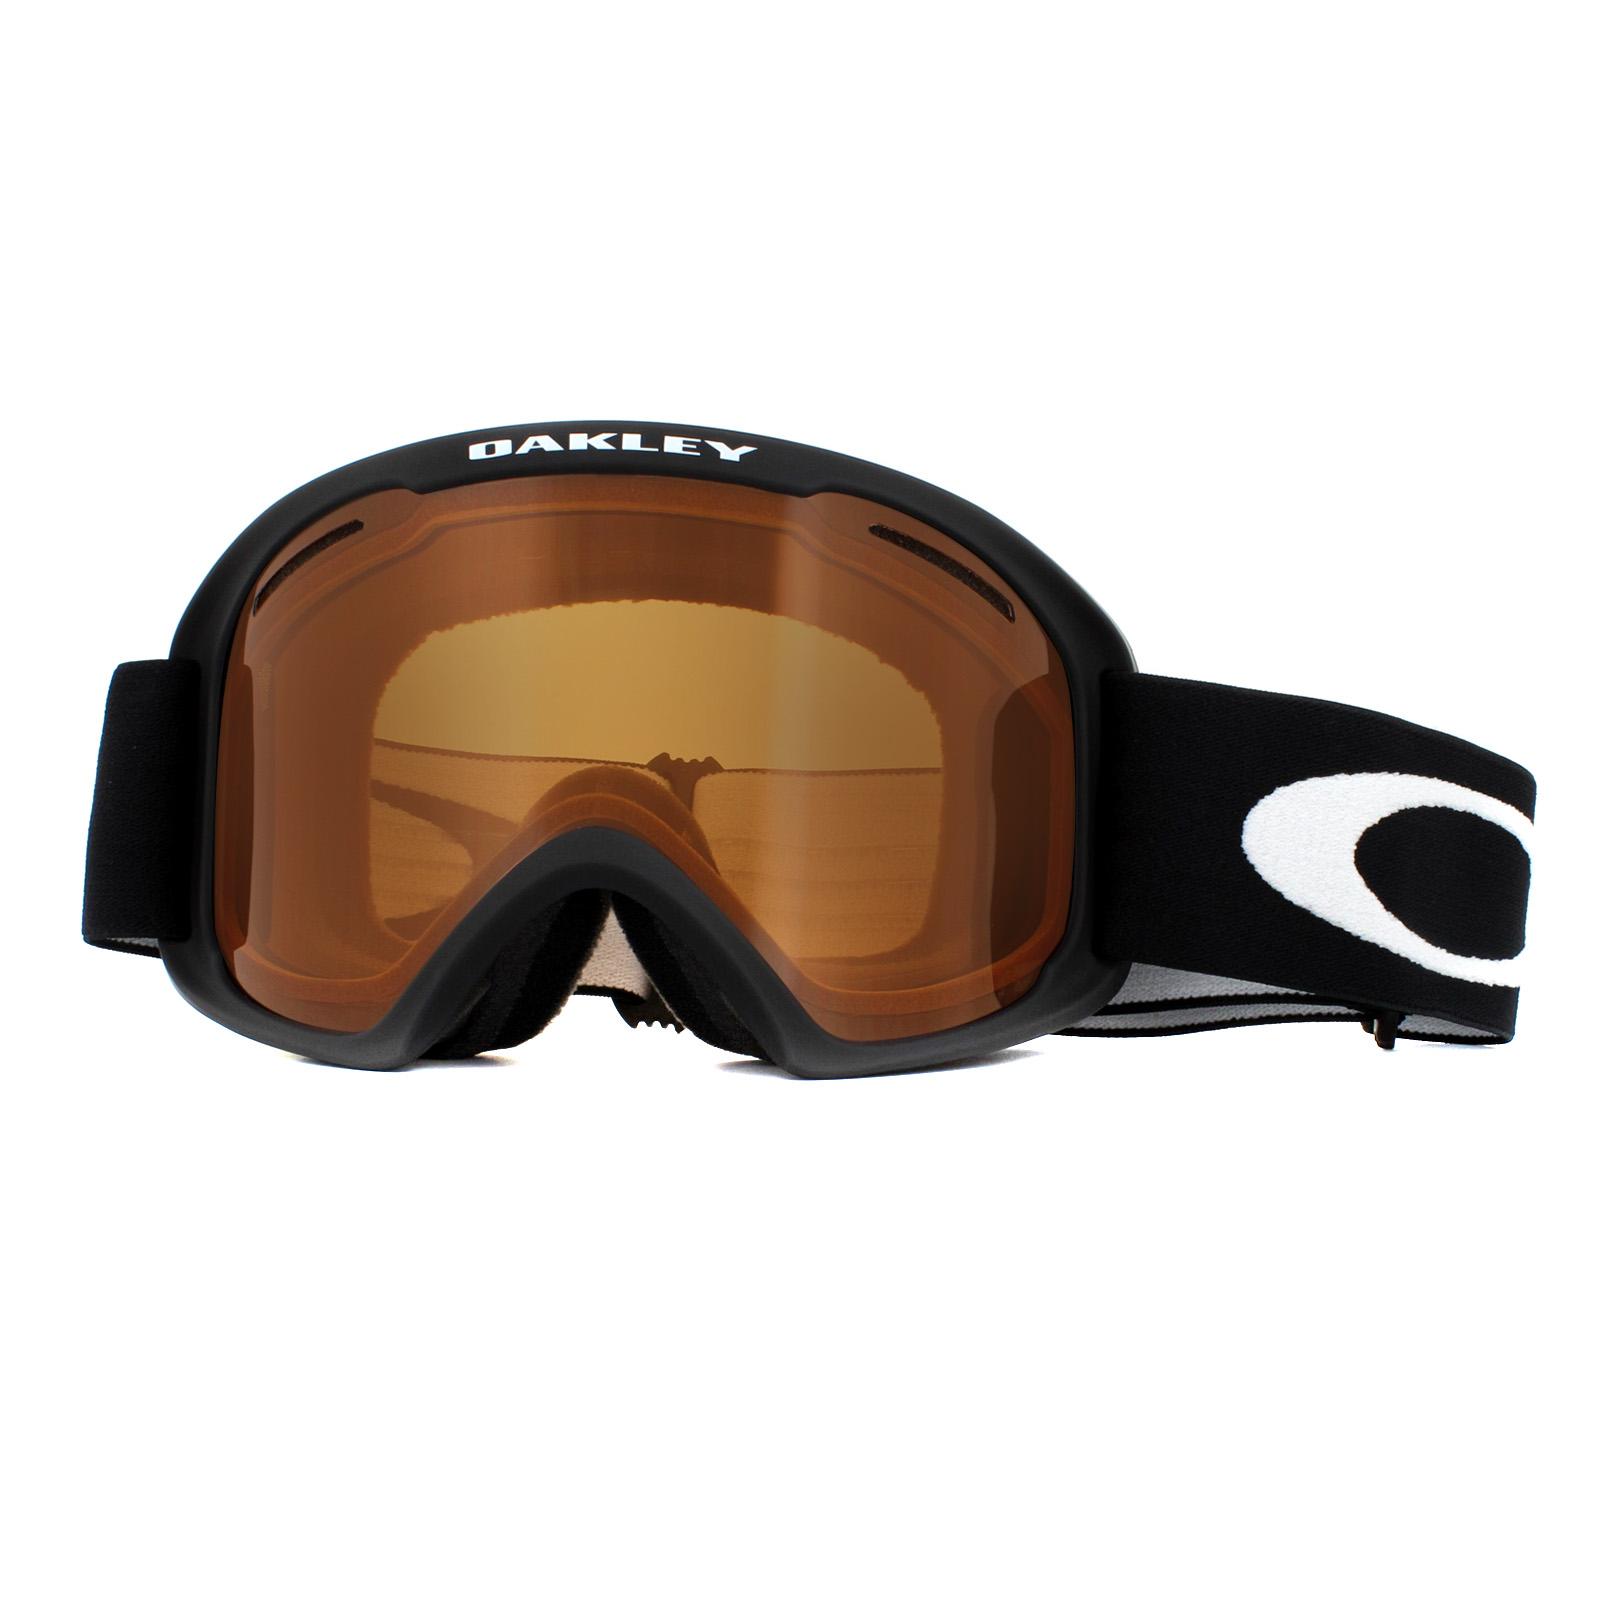 56503084462 Cheap Oakley 02 XL Goggles - Discounted Sunglasses